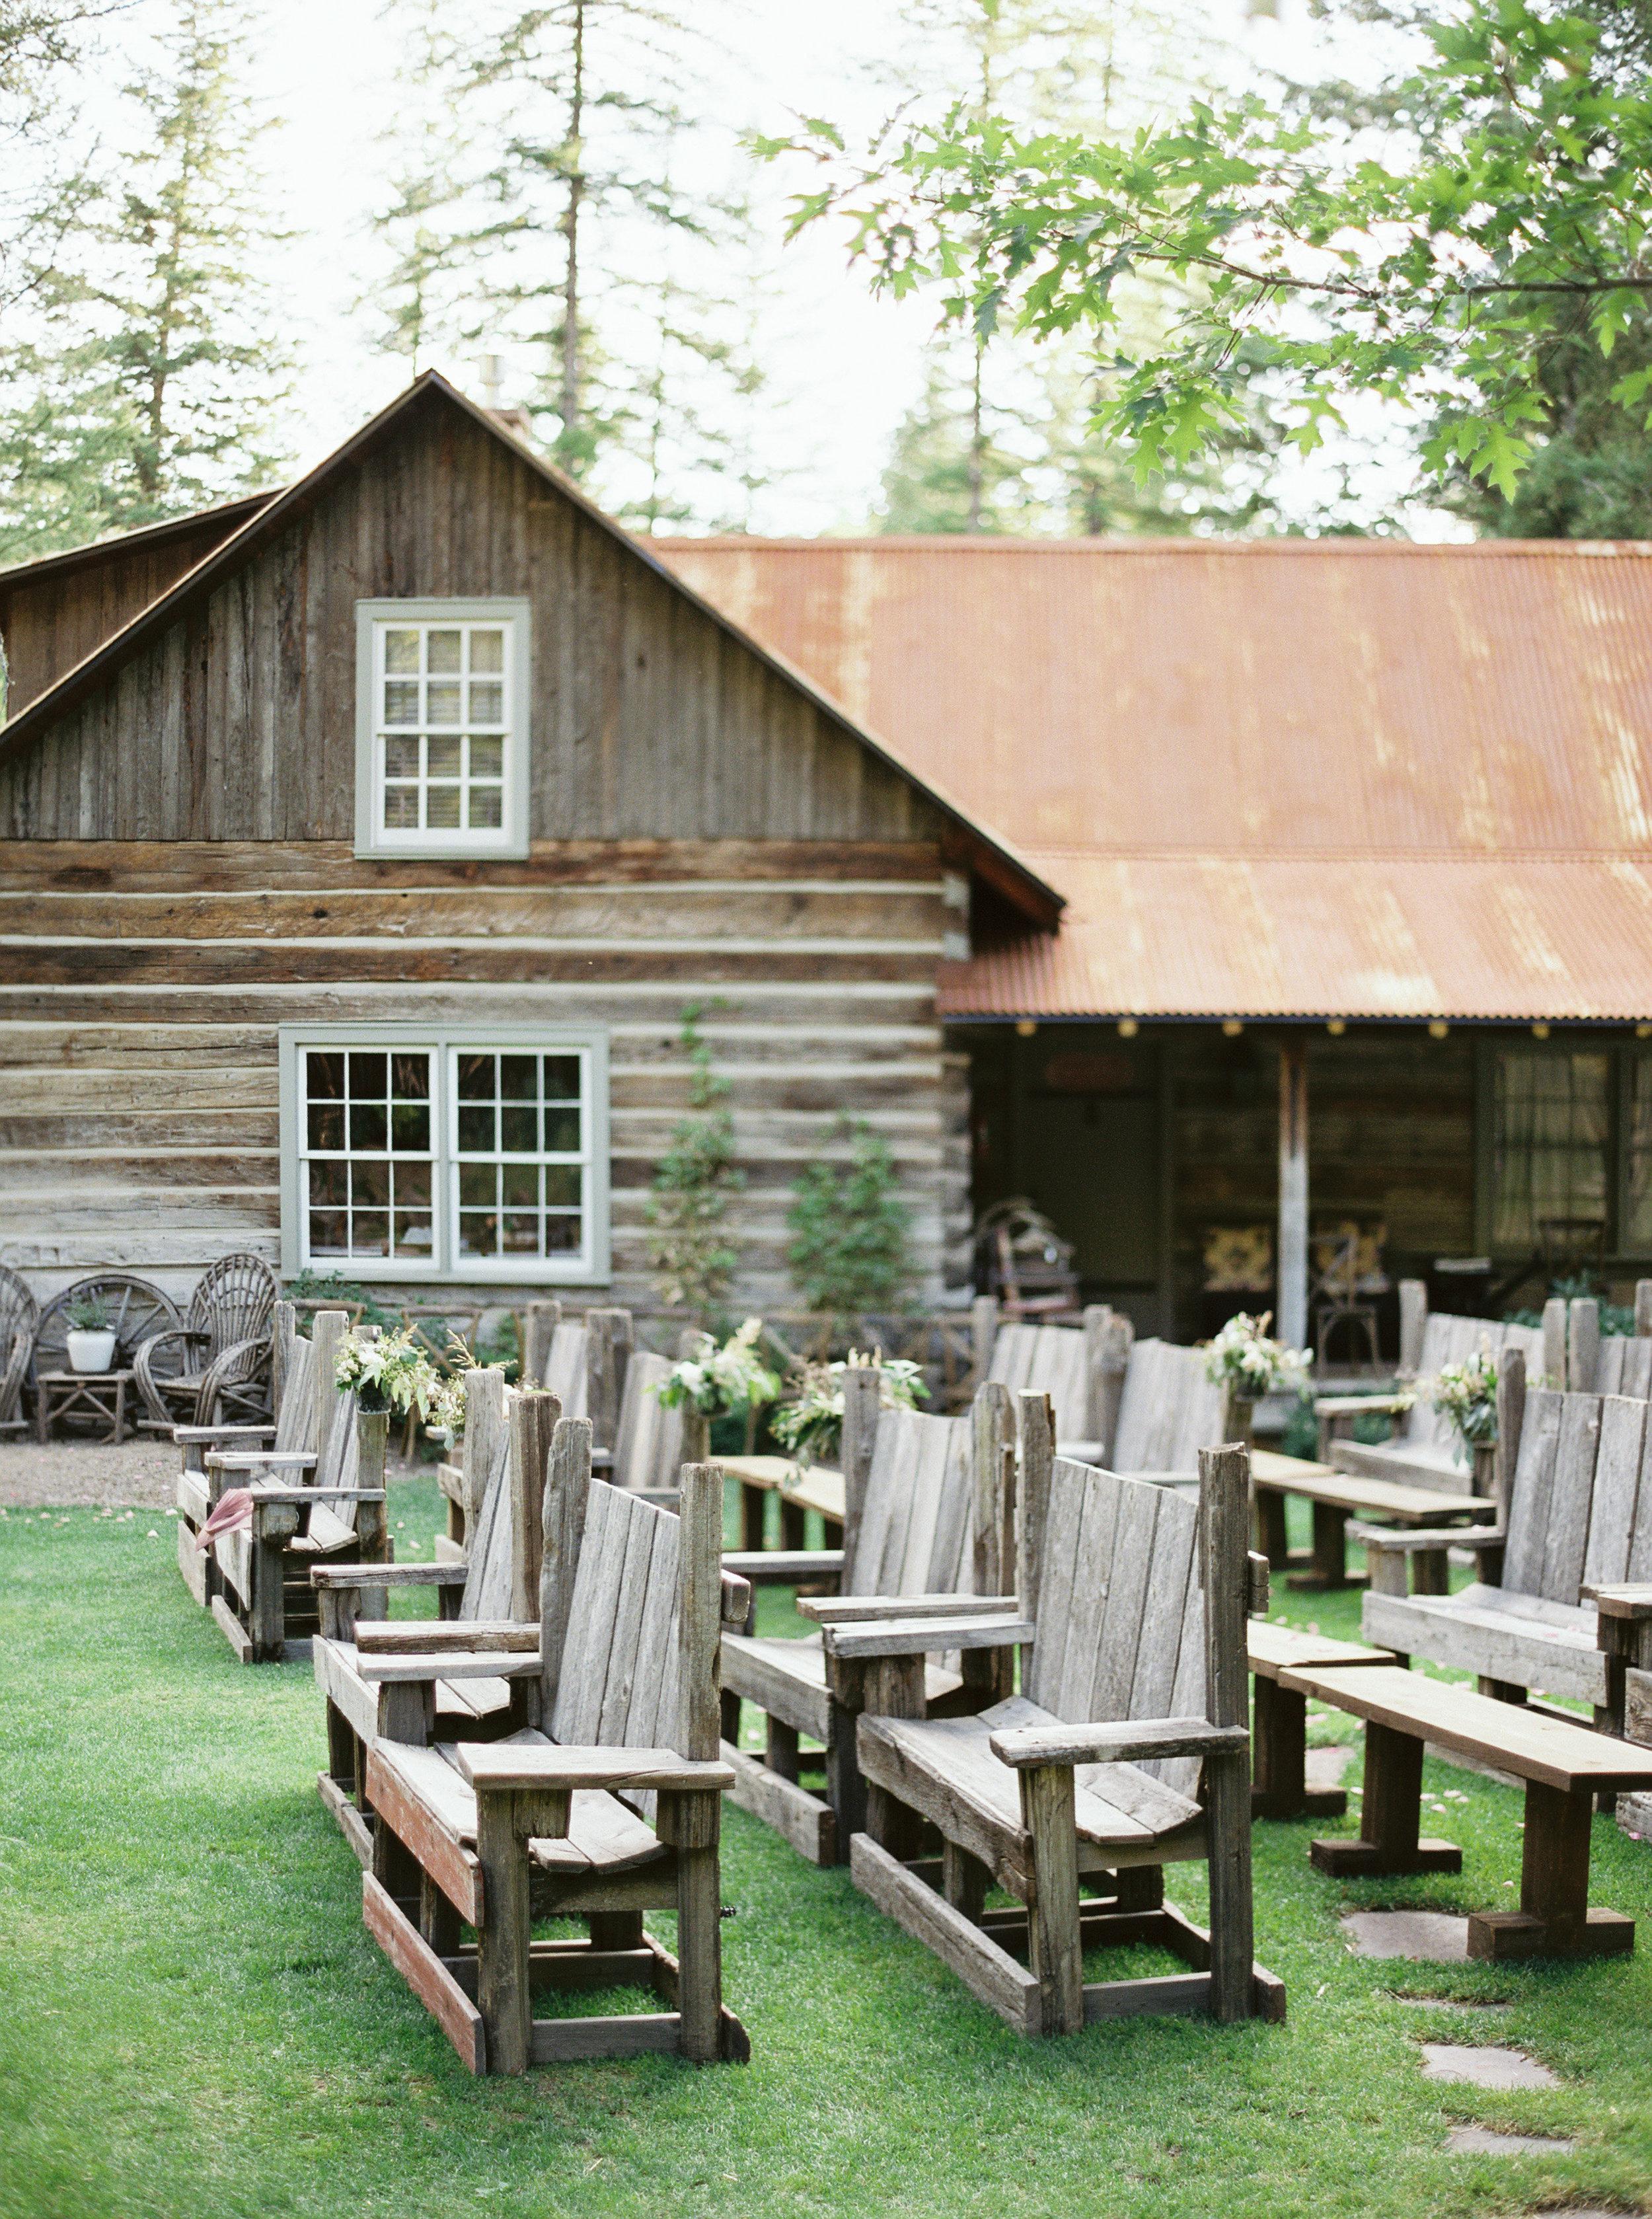 Rustic Montana Wedding Ceremony Pews at the Weatherwood Homestead